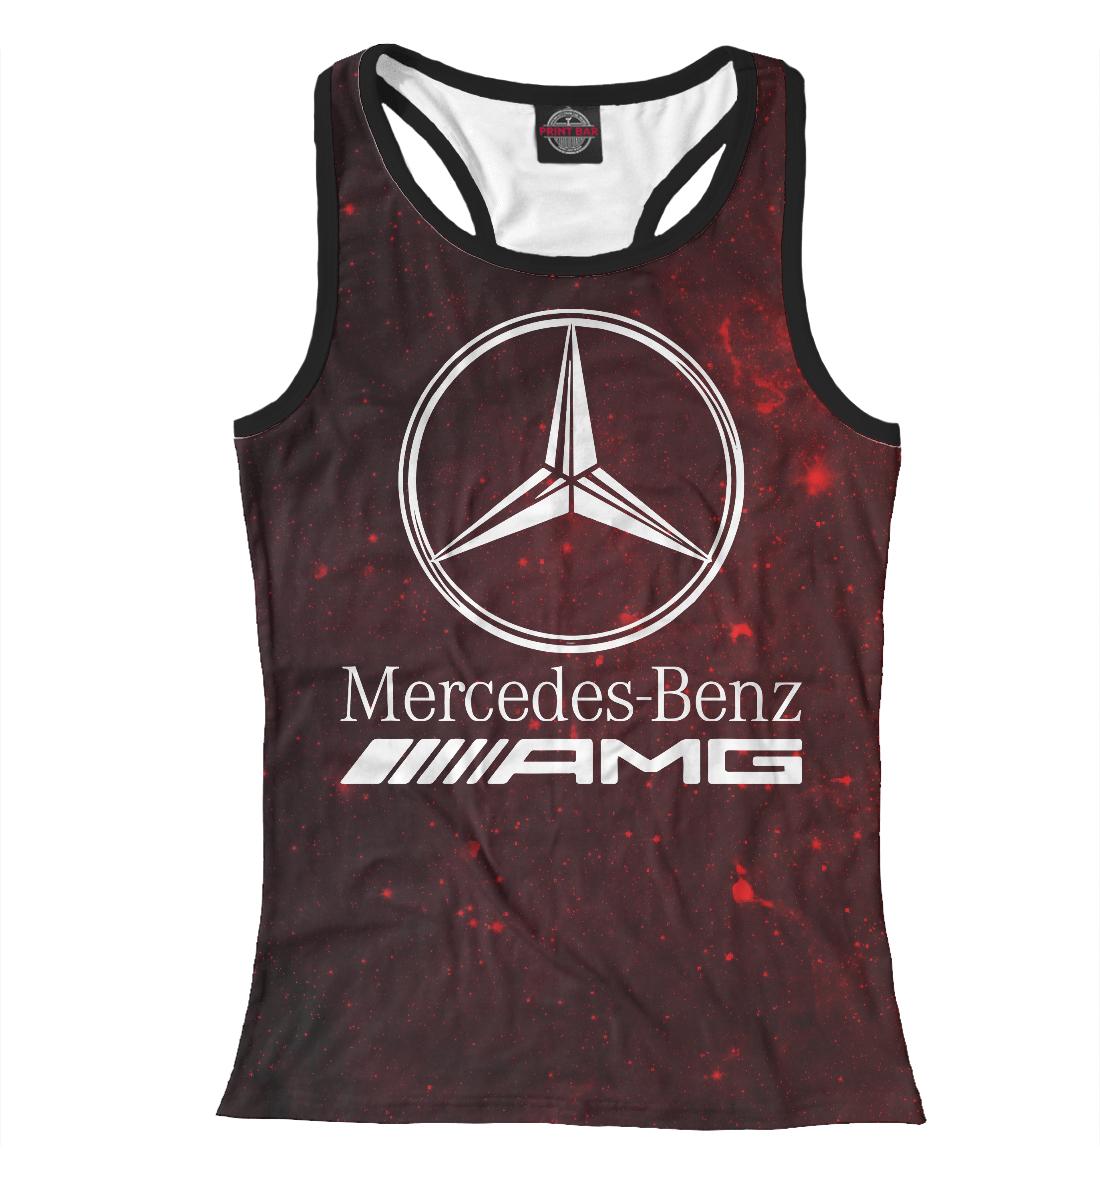 Купить Mersedes-Benz AMG, Printbar, Майки борцовки, MER-894939-mayb-1